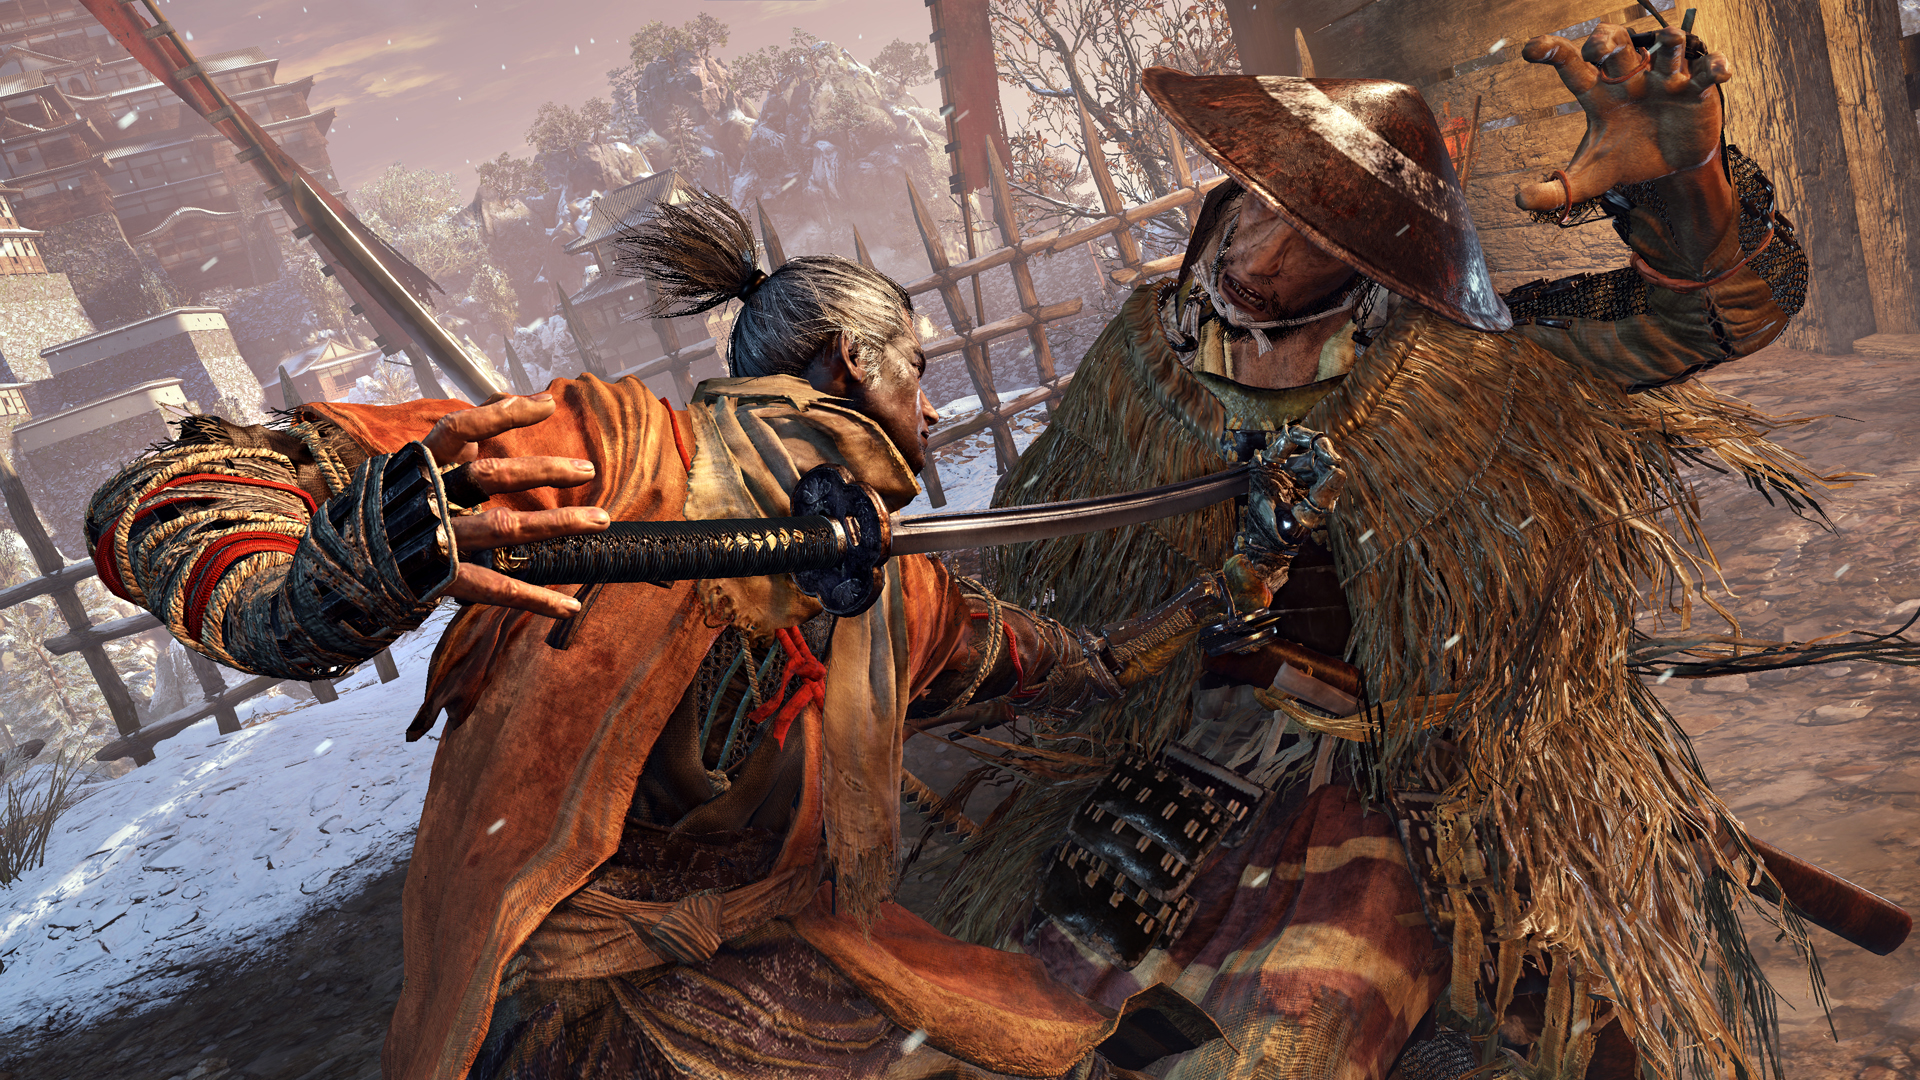 General 1920x1080 sekiro shadows die twice Sekiro: Shadows Die Twice From Software video games